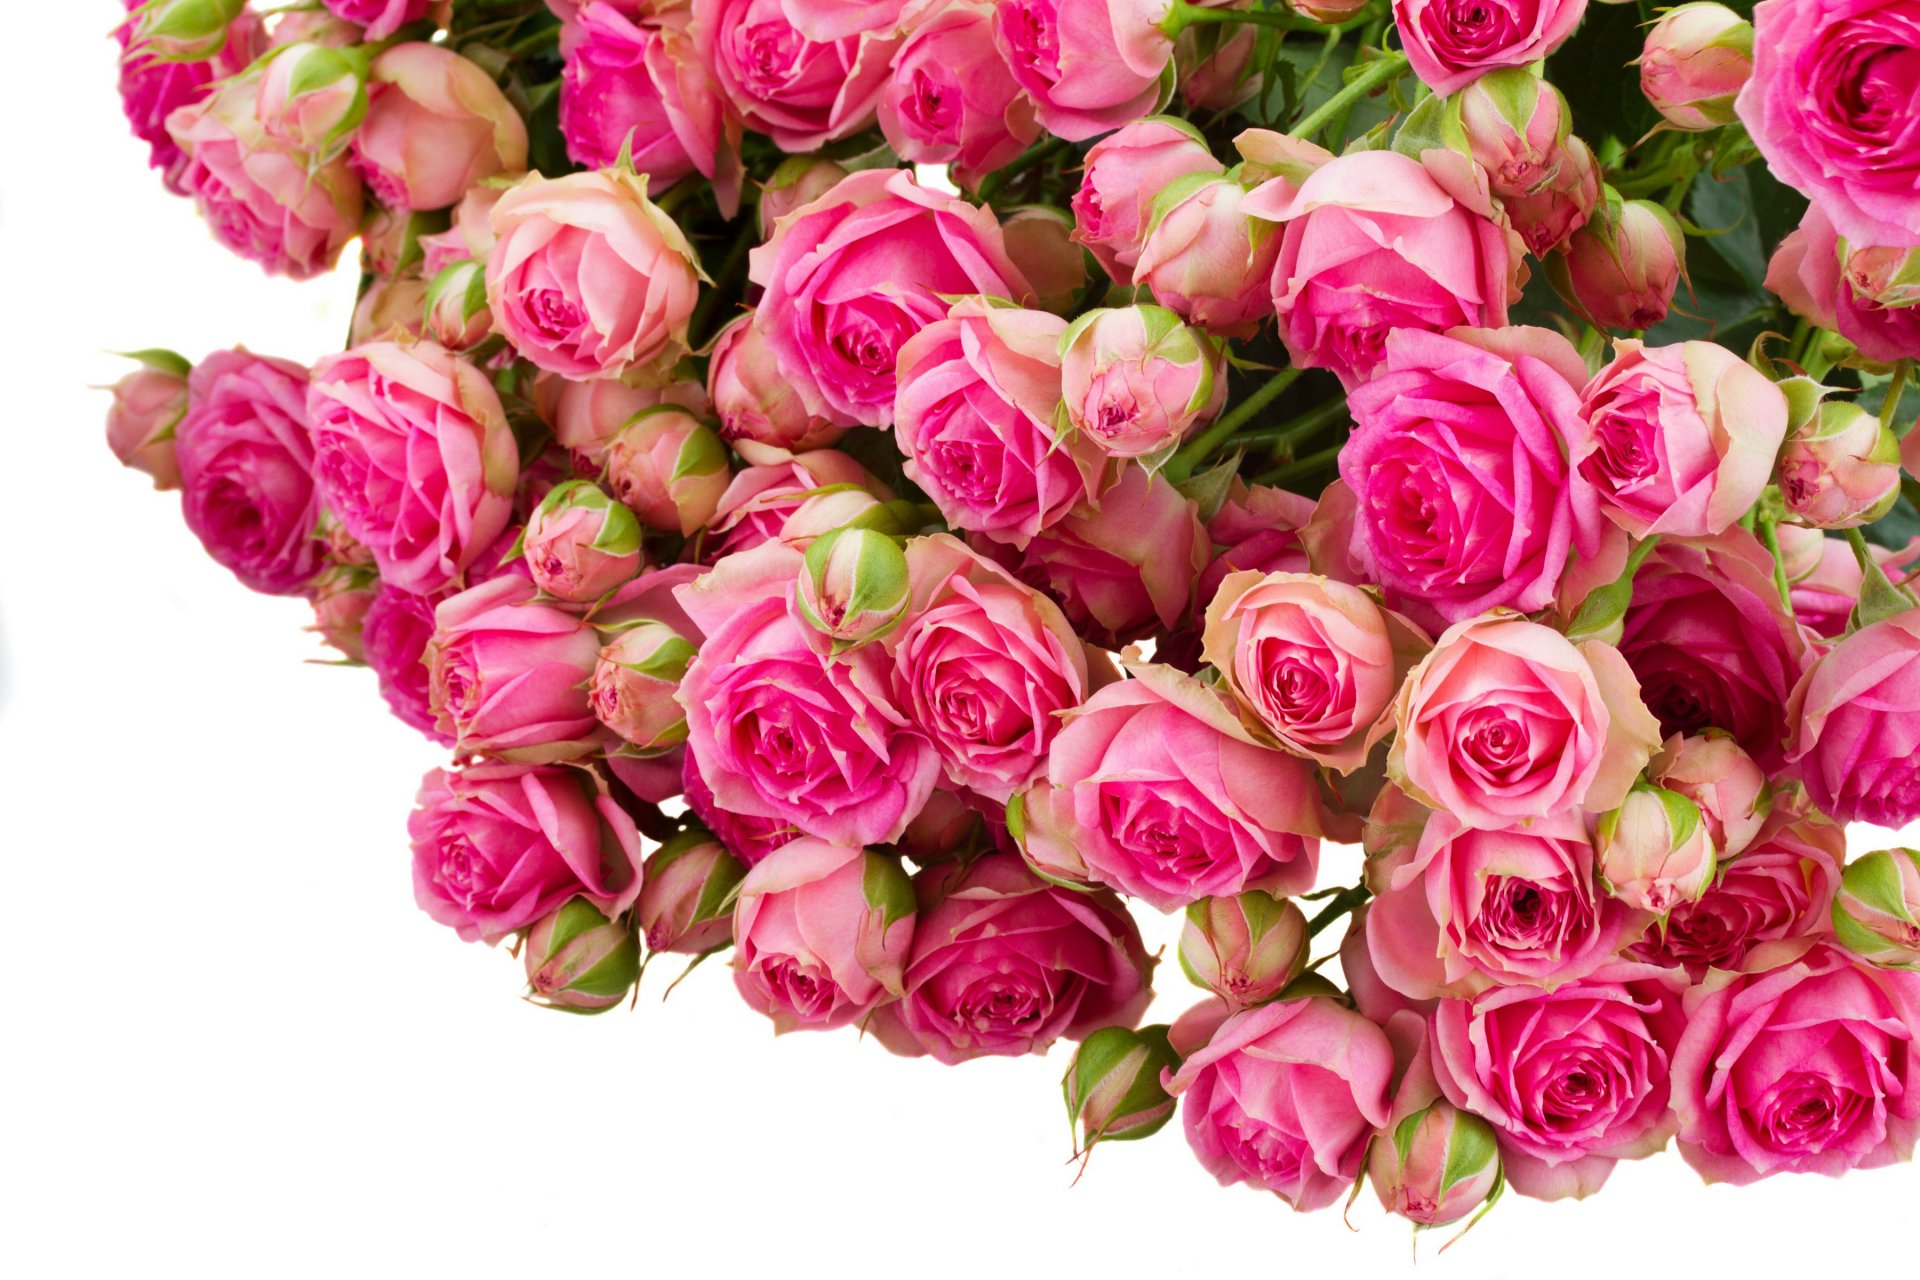 Букет роз на белом фоне открытка